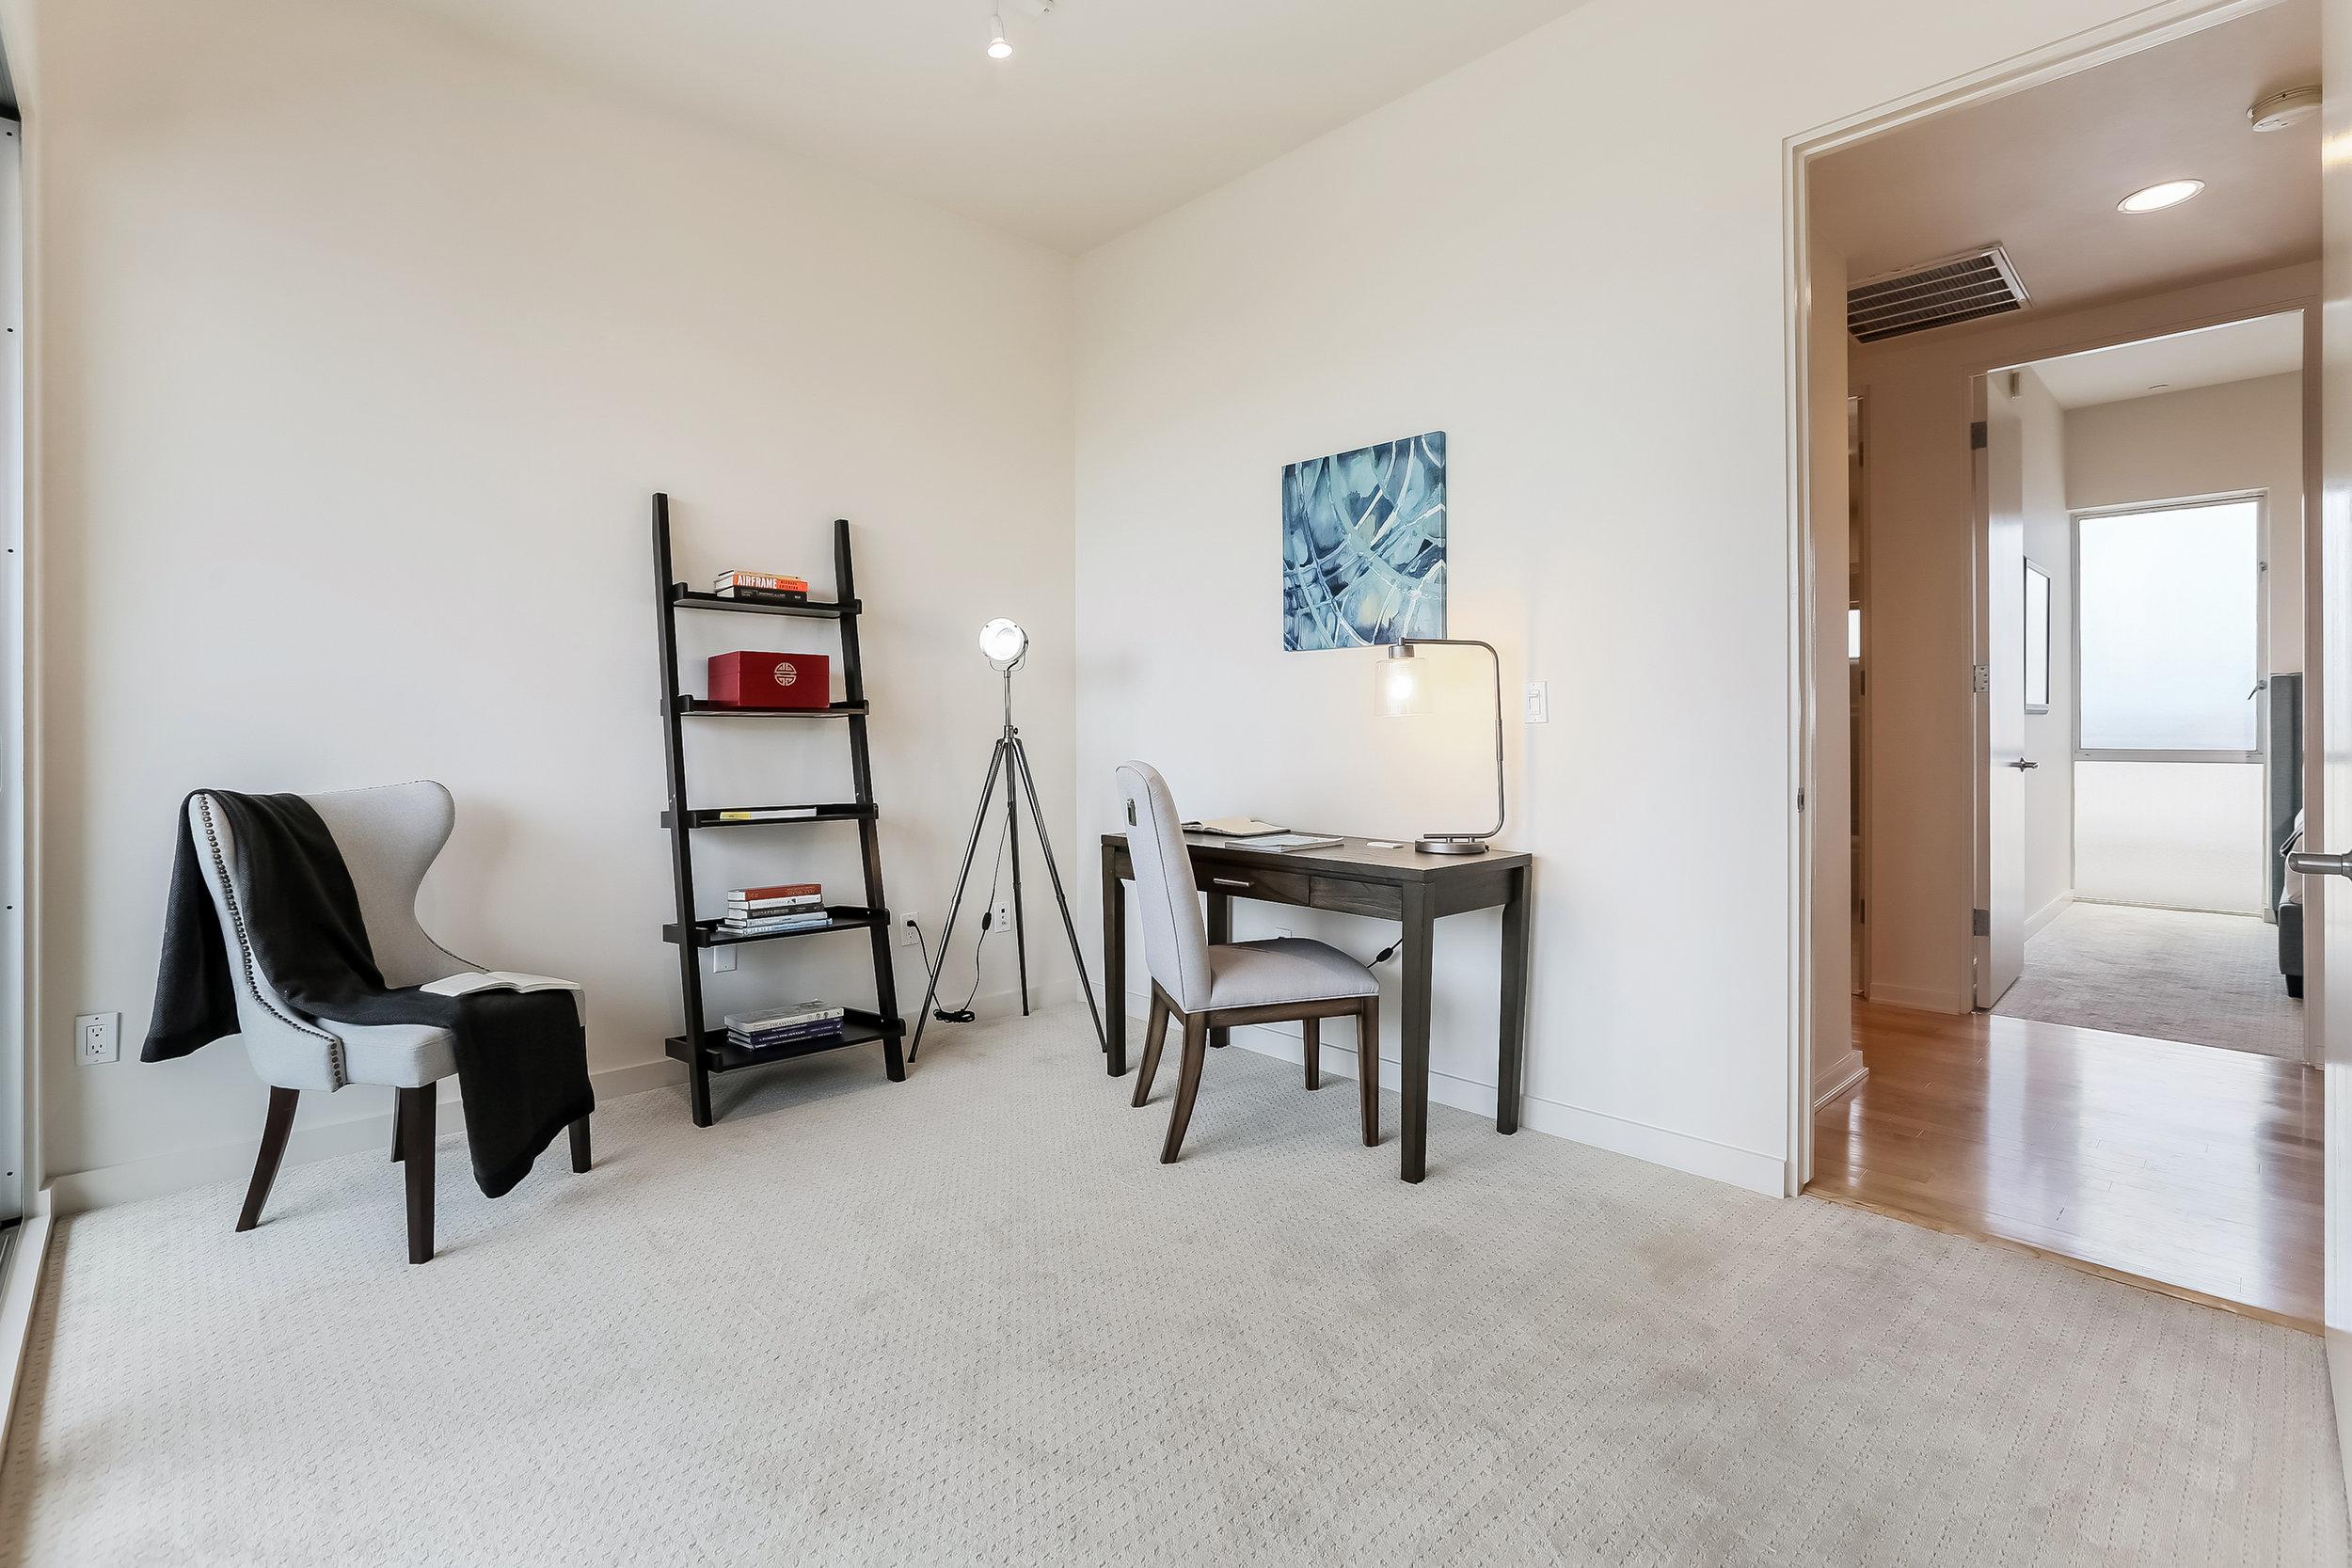 018-photo-master-bedroom-6209680 copy.jpg